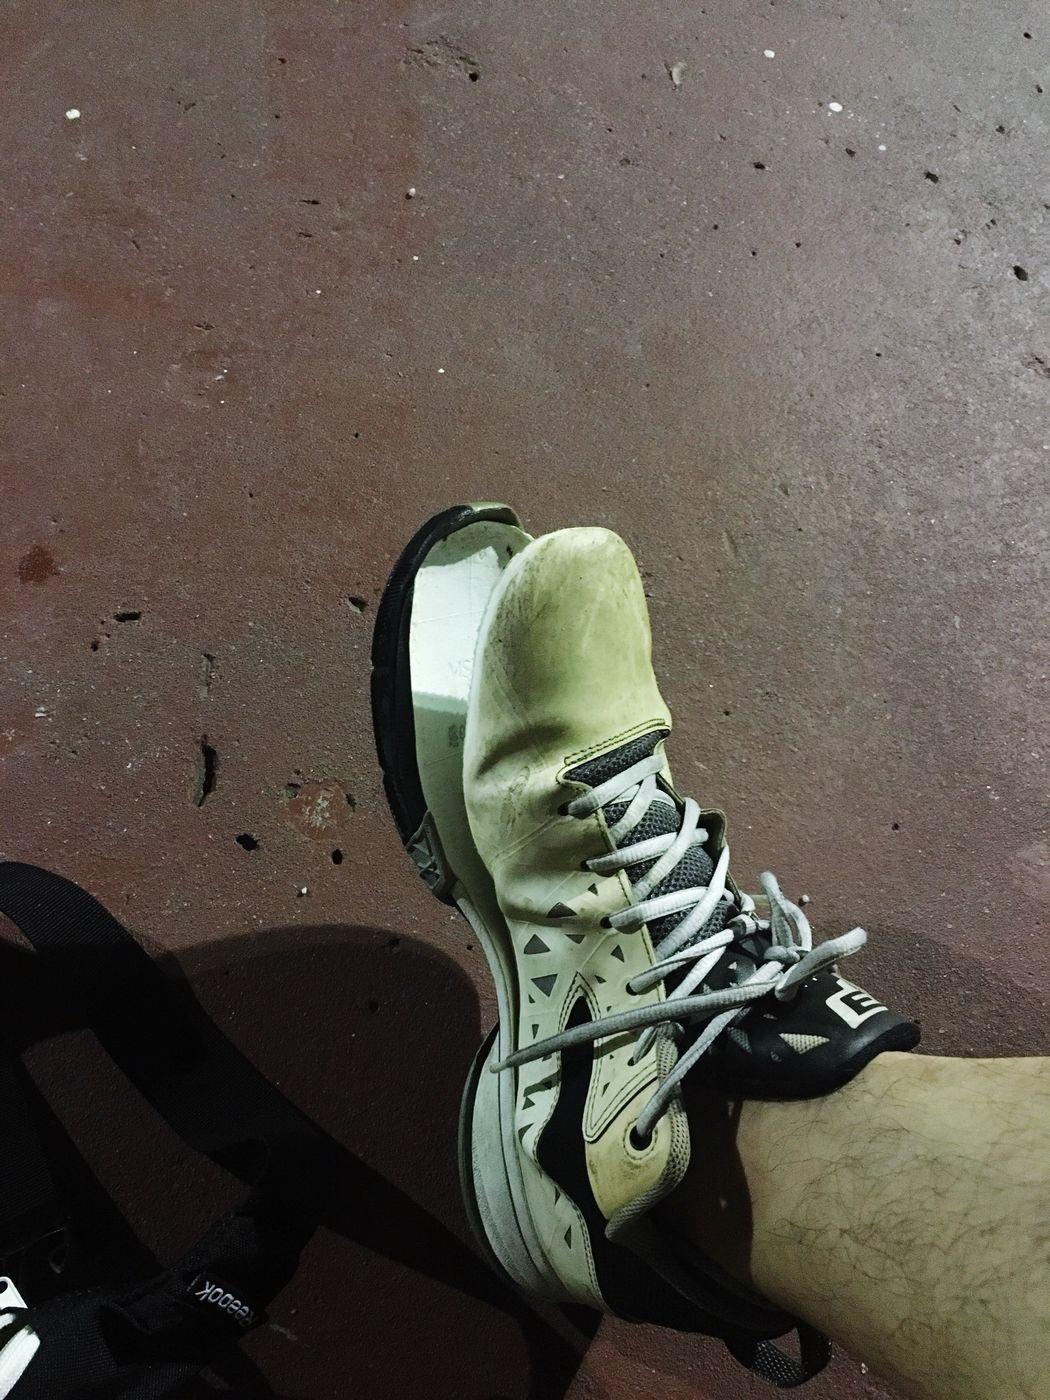 End of life Jordancp3 Sneakers